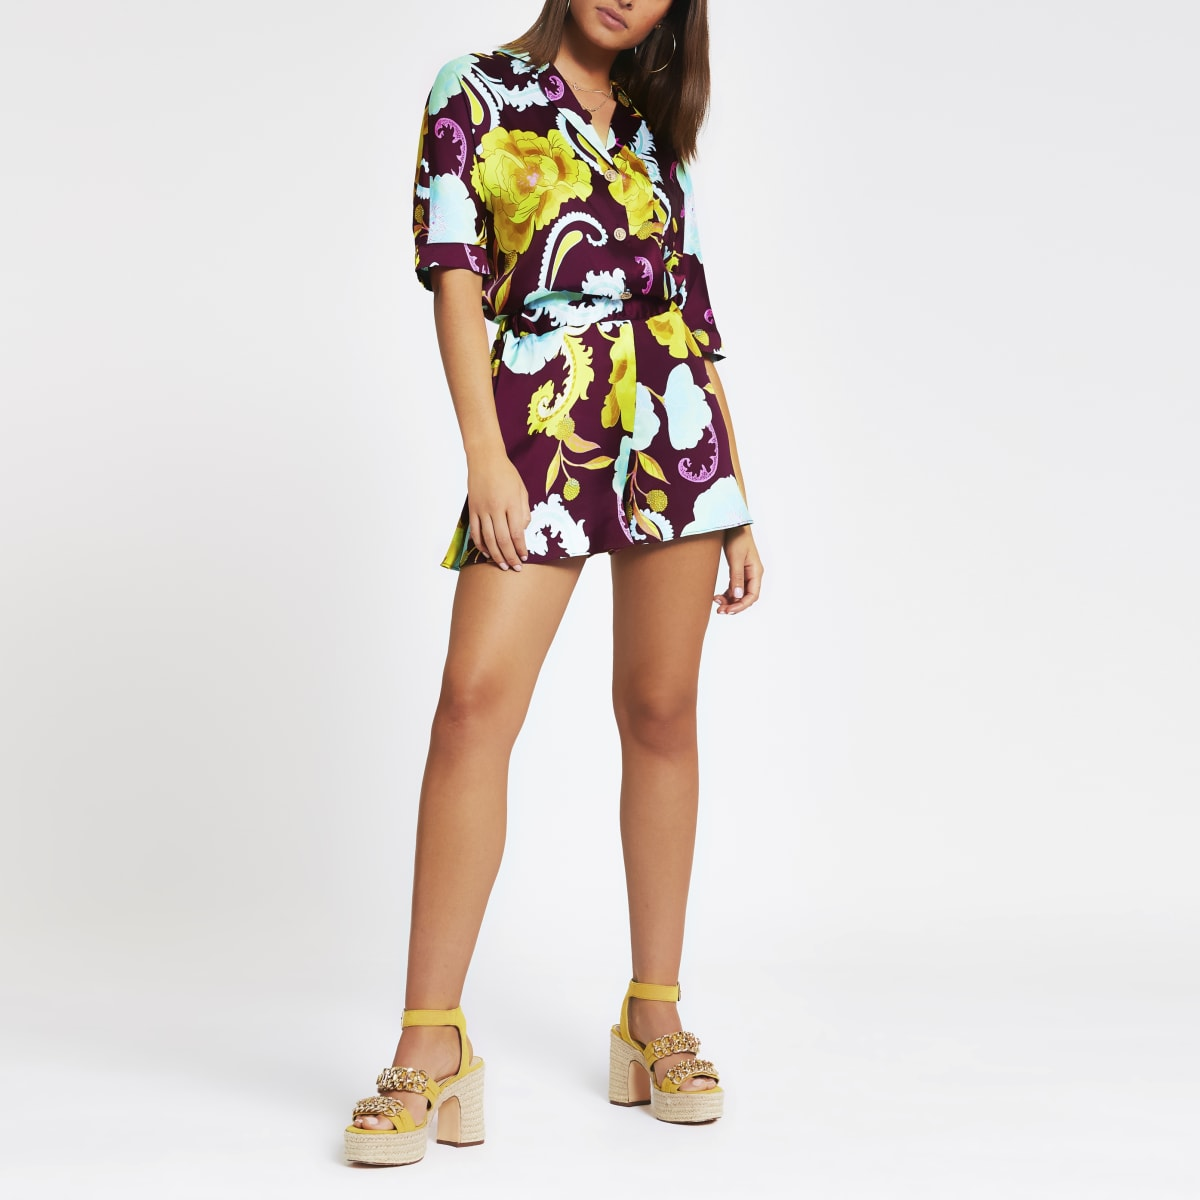 Caroline Flack purple floral print shorts